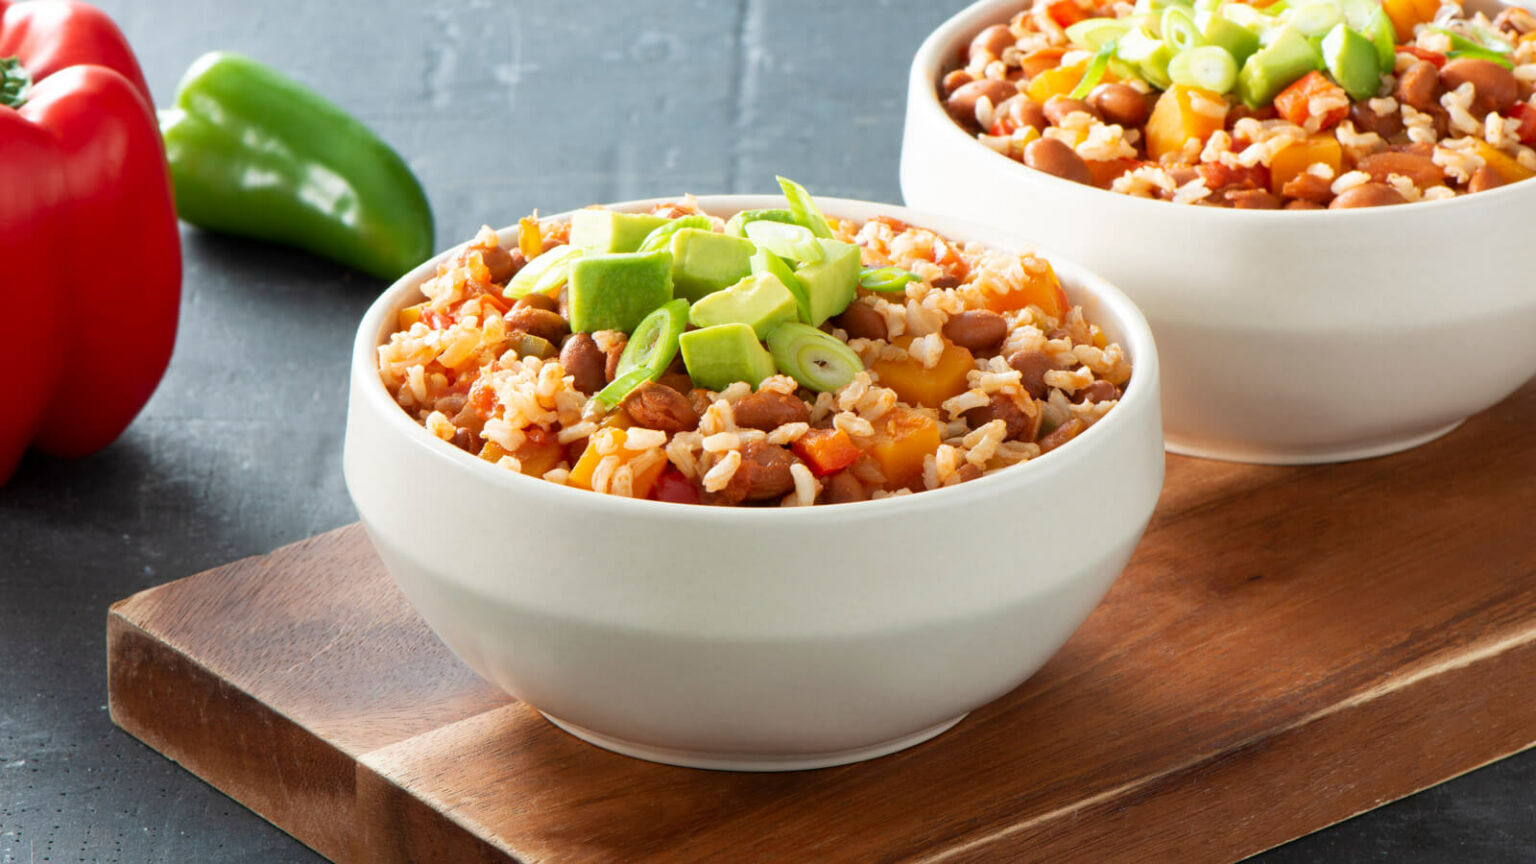 Vegetarian Pumpkin & Brown Rice Chili